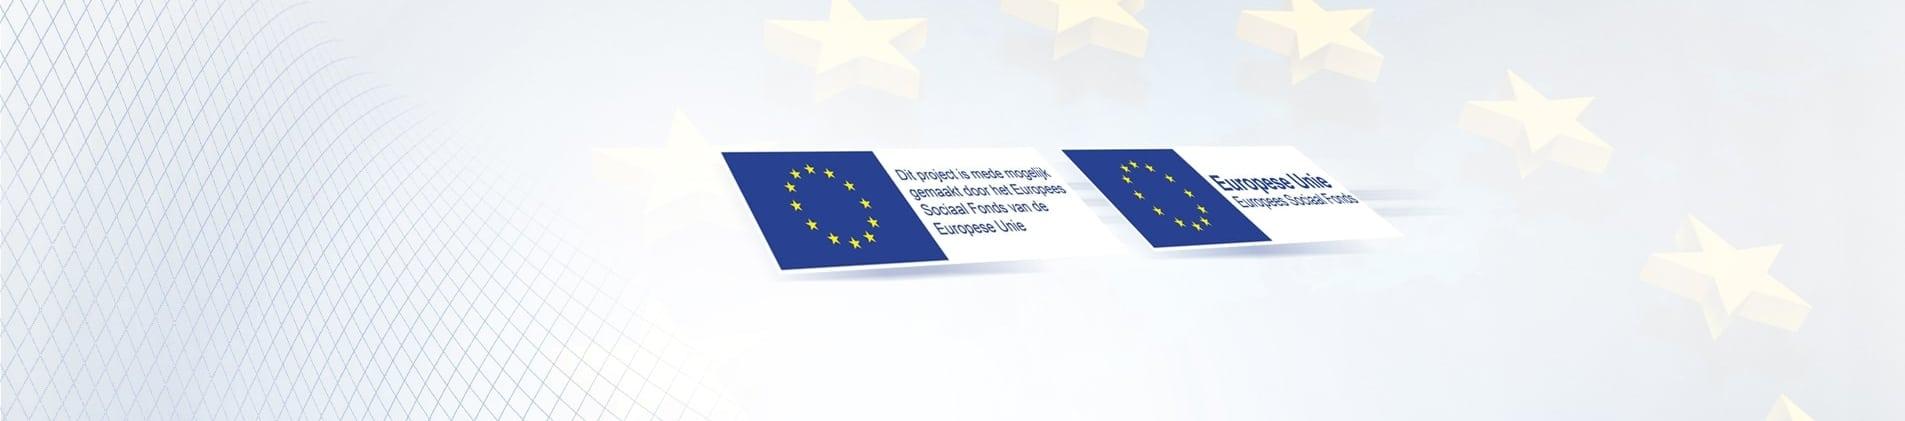 Header_Europees_sociaal_fonds